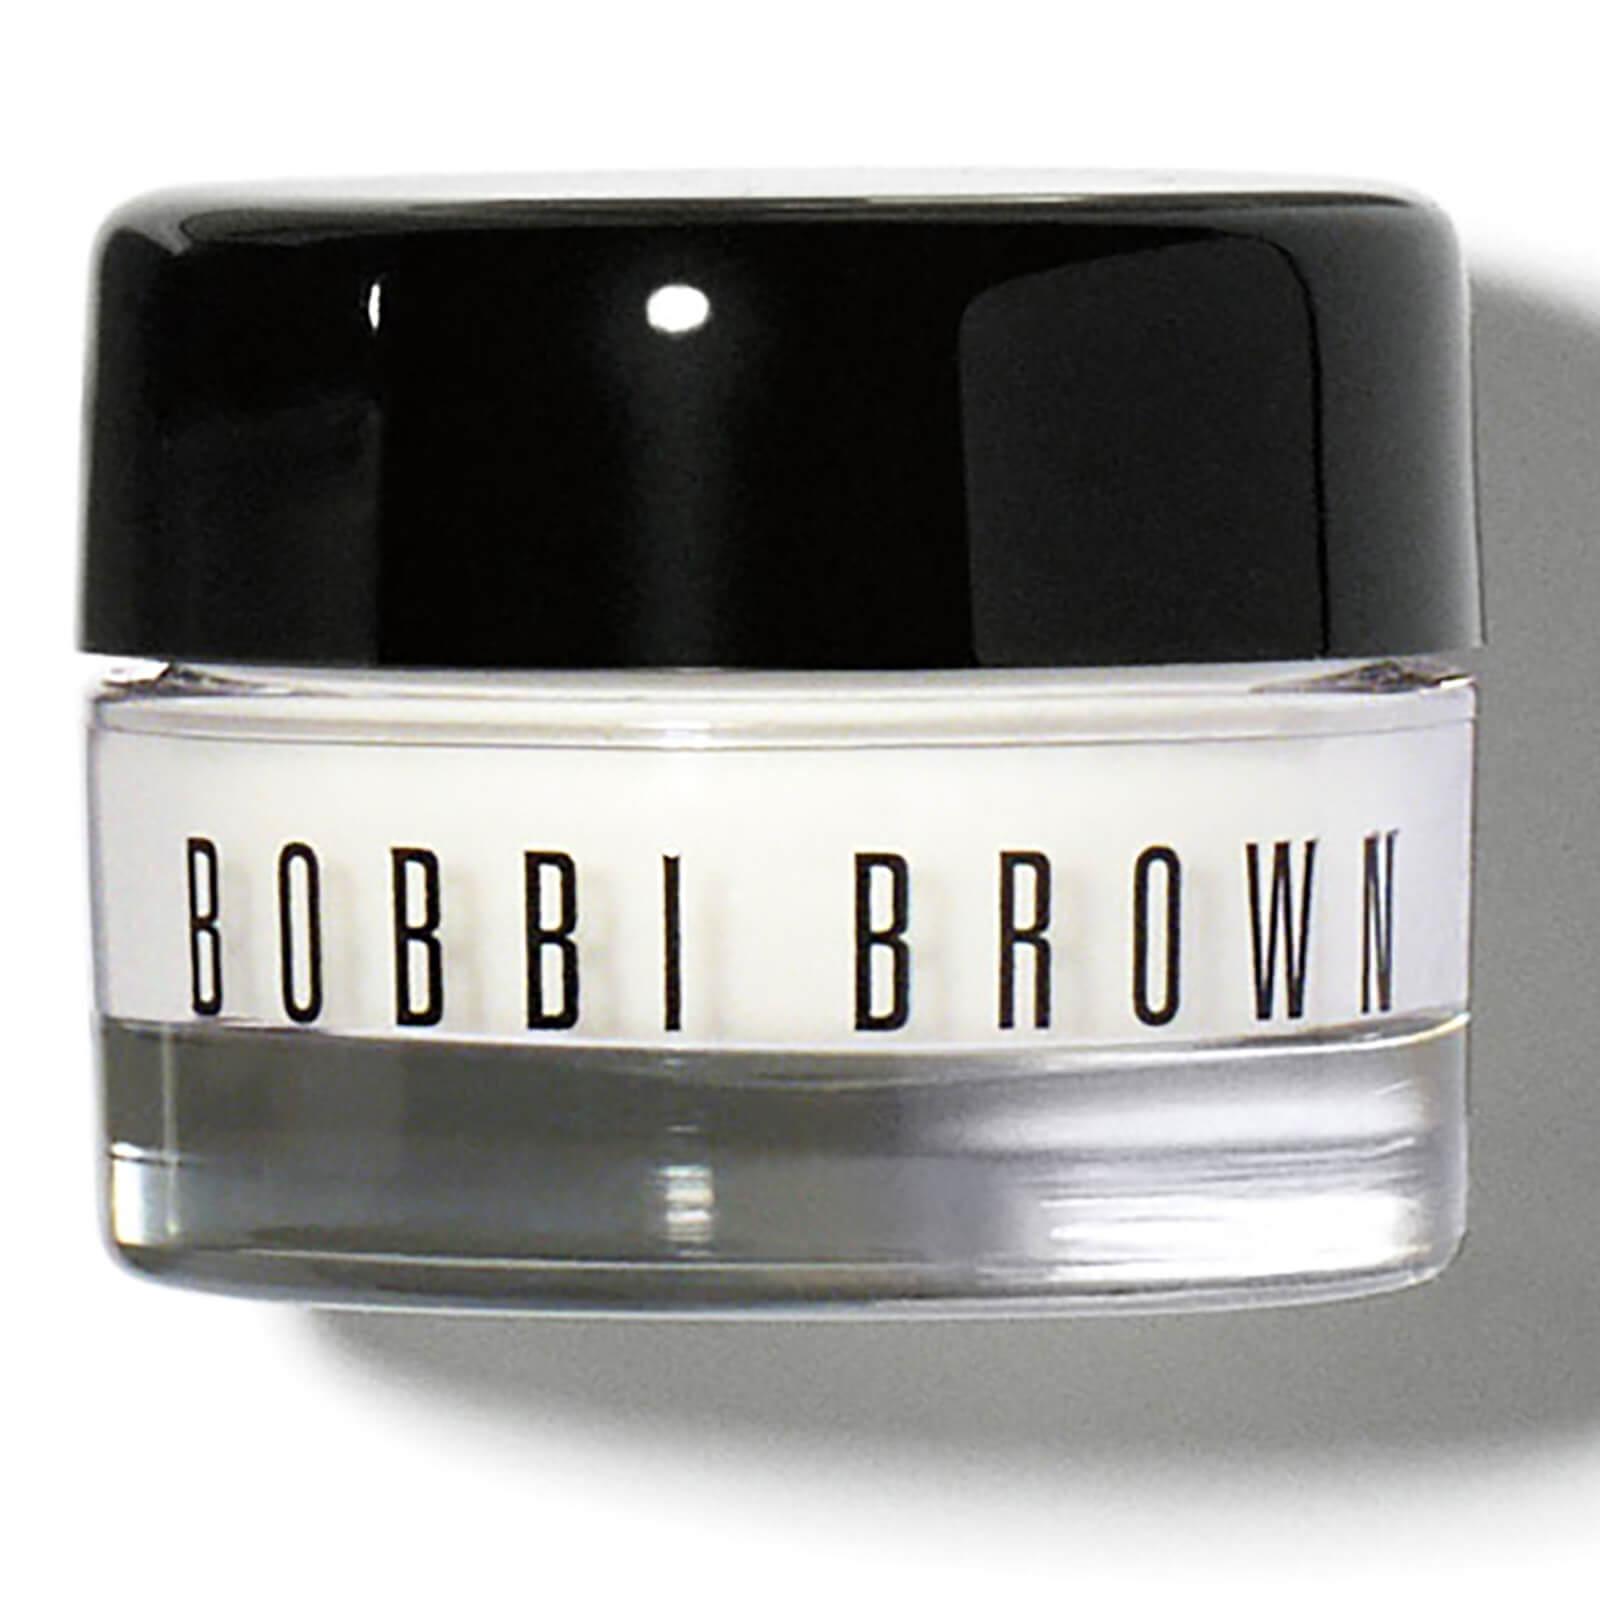 Bobbi Brown Hydrating Face Cream 7ml/0.24 fl oz.